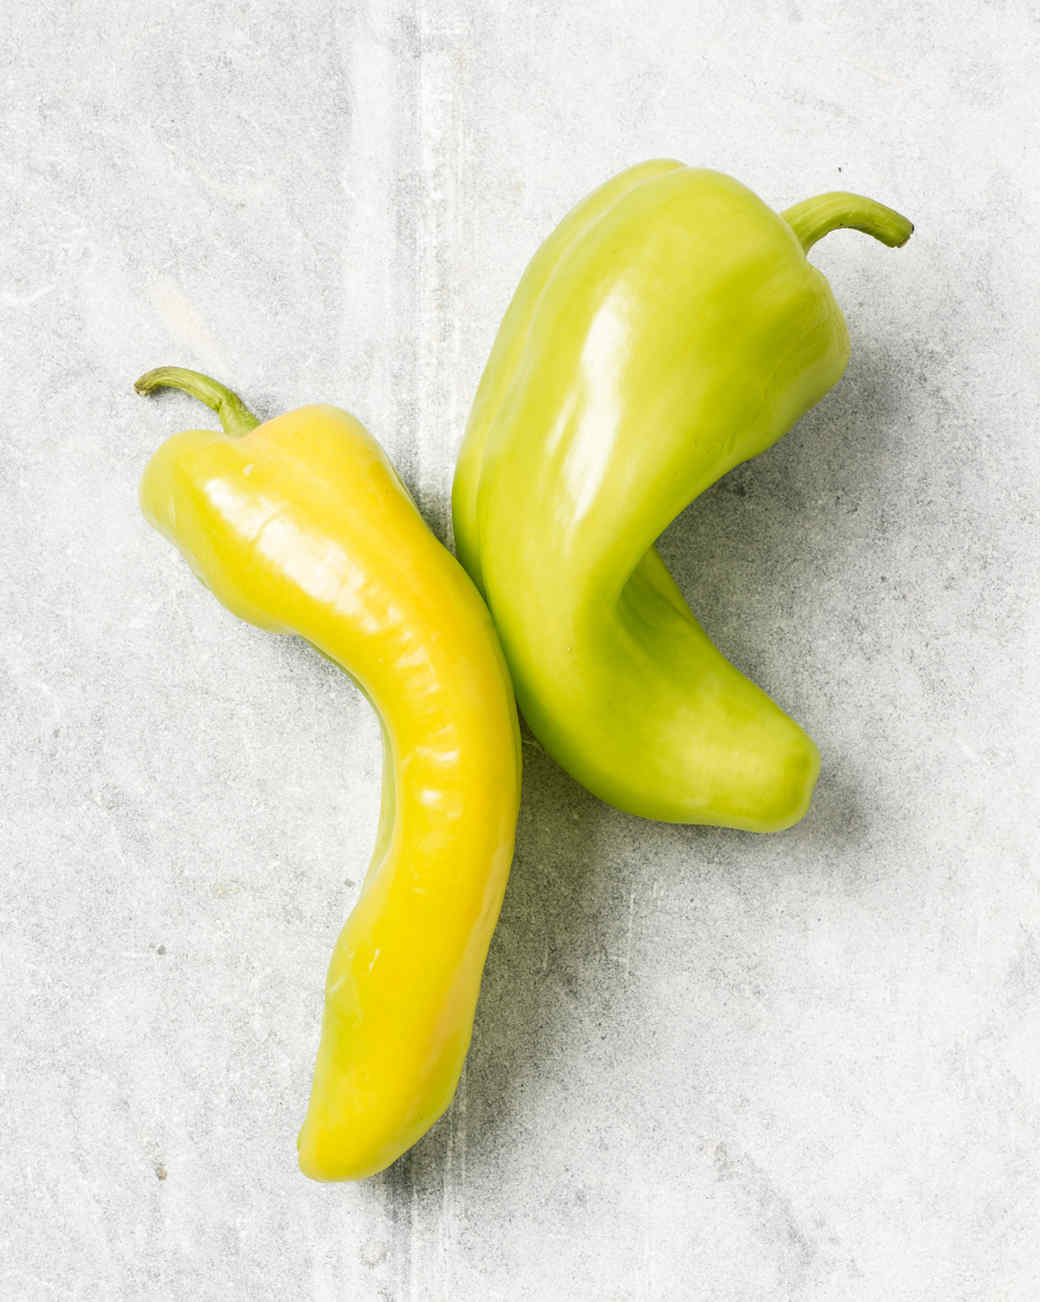 cubanelle-peppers-166-d110163.jpg